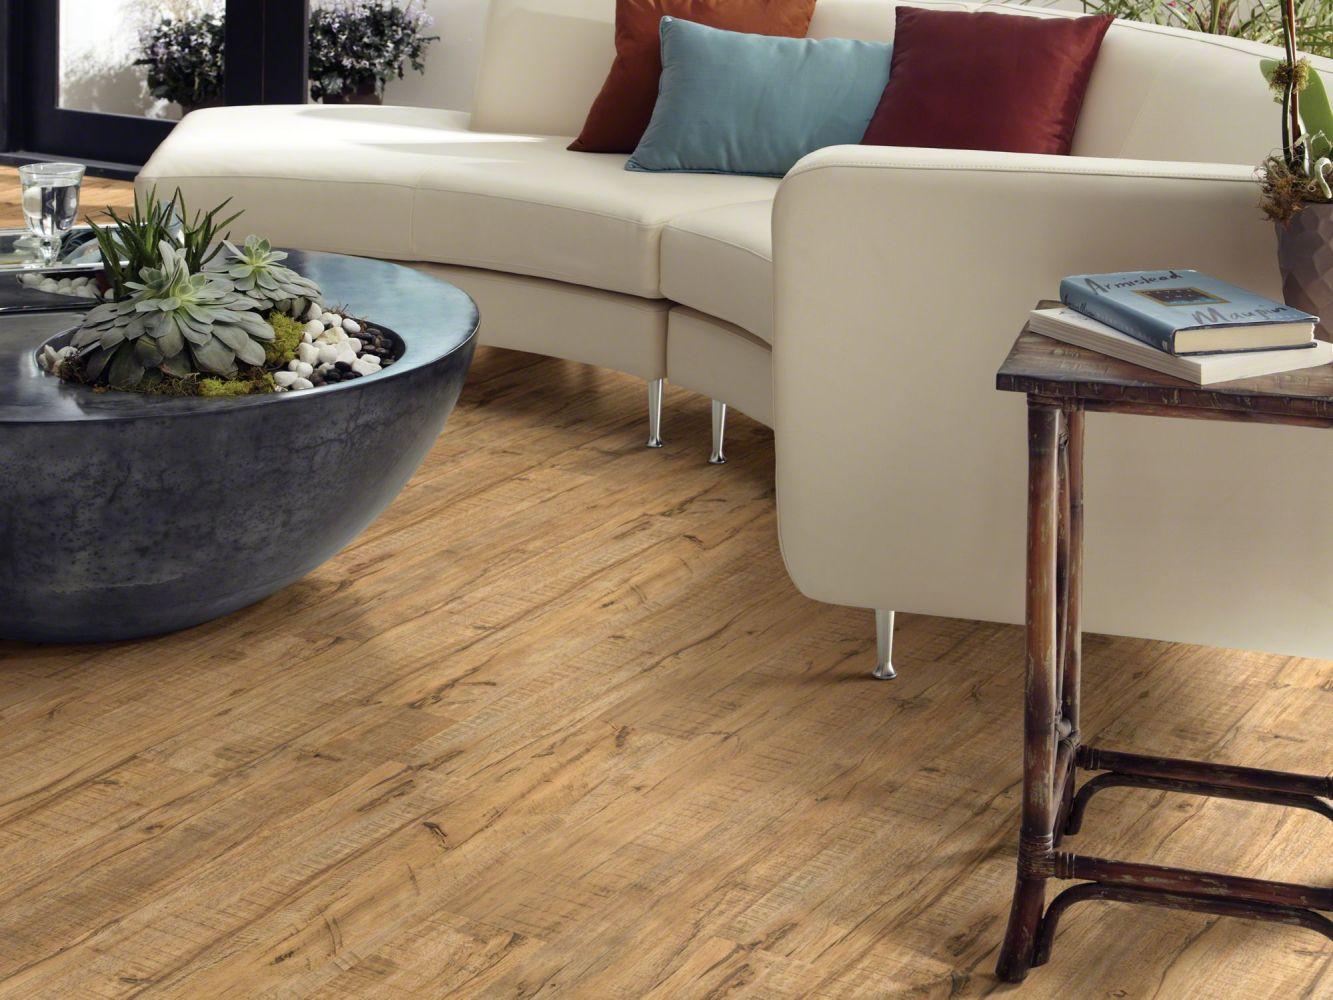 Shaw Floors Nfa HS Take It Easy Muslin 00224_VH509